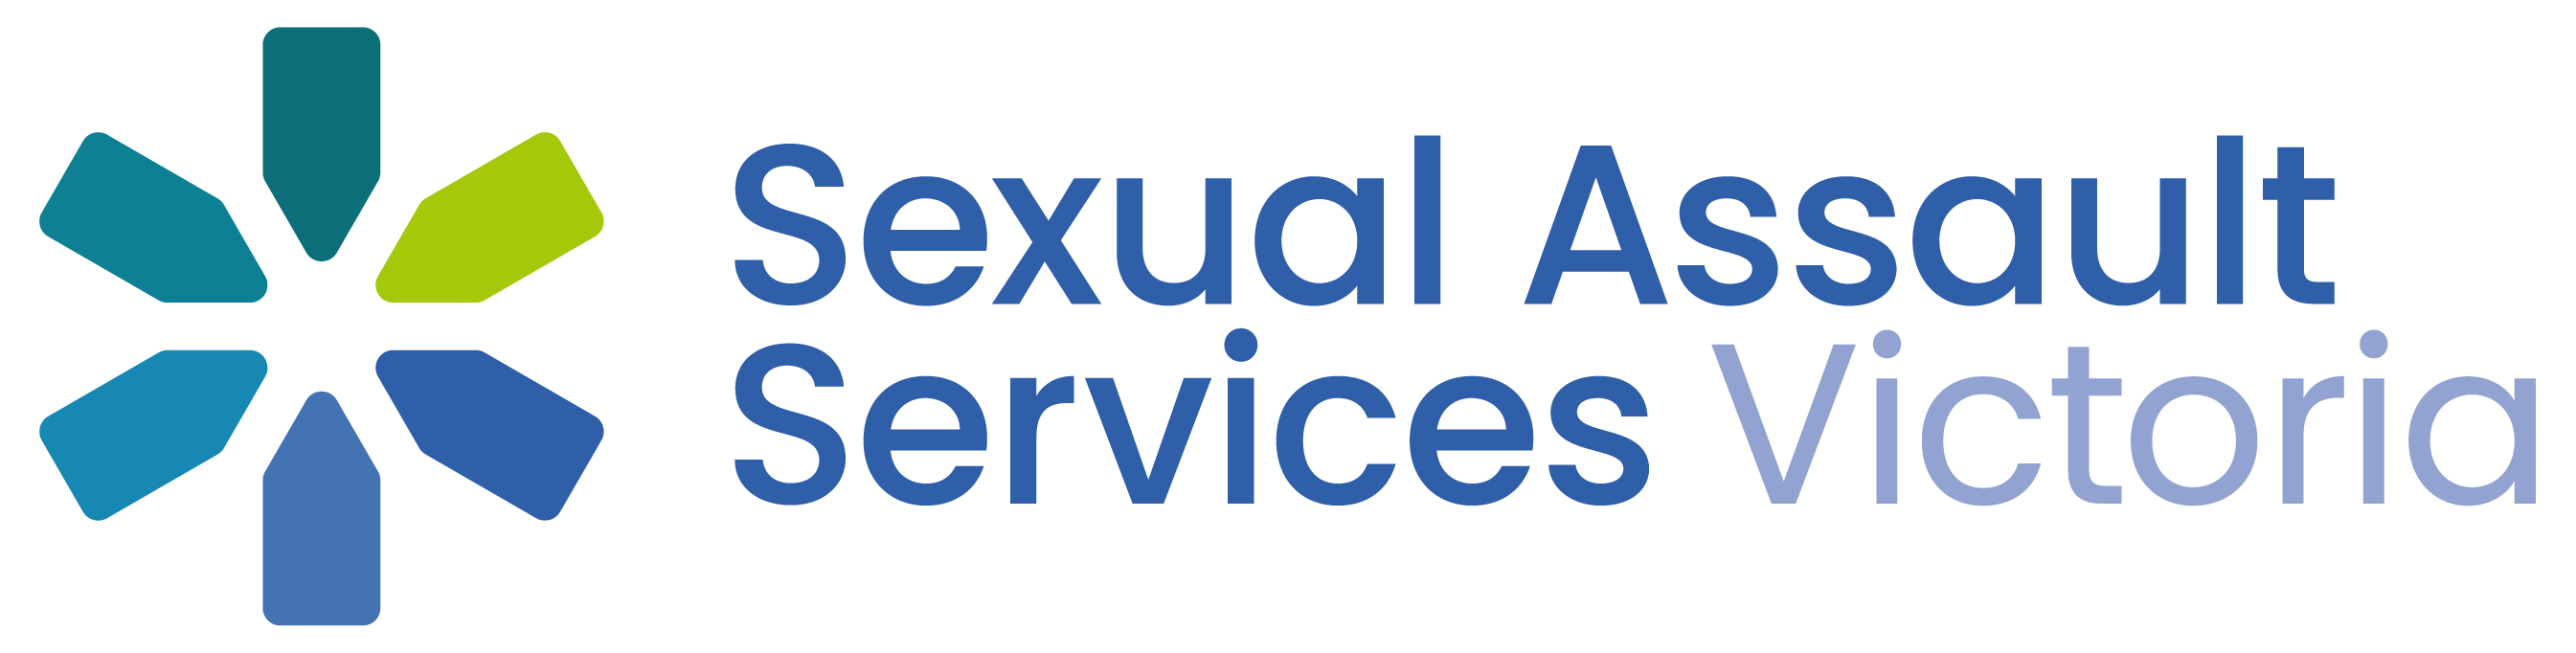 Sexual-Assault-Services-Victoria-logo